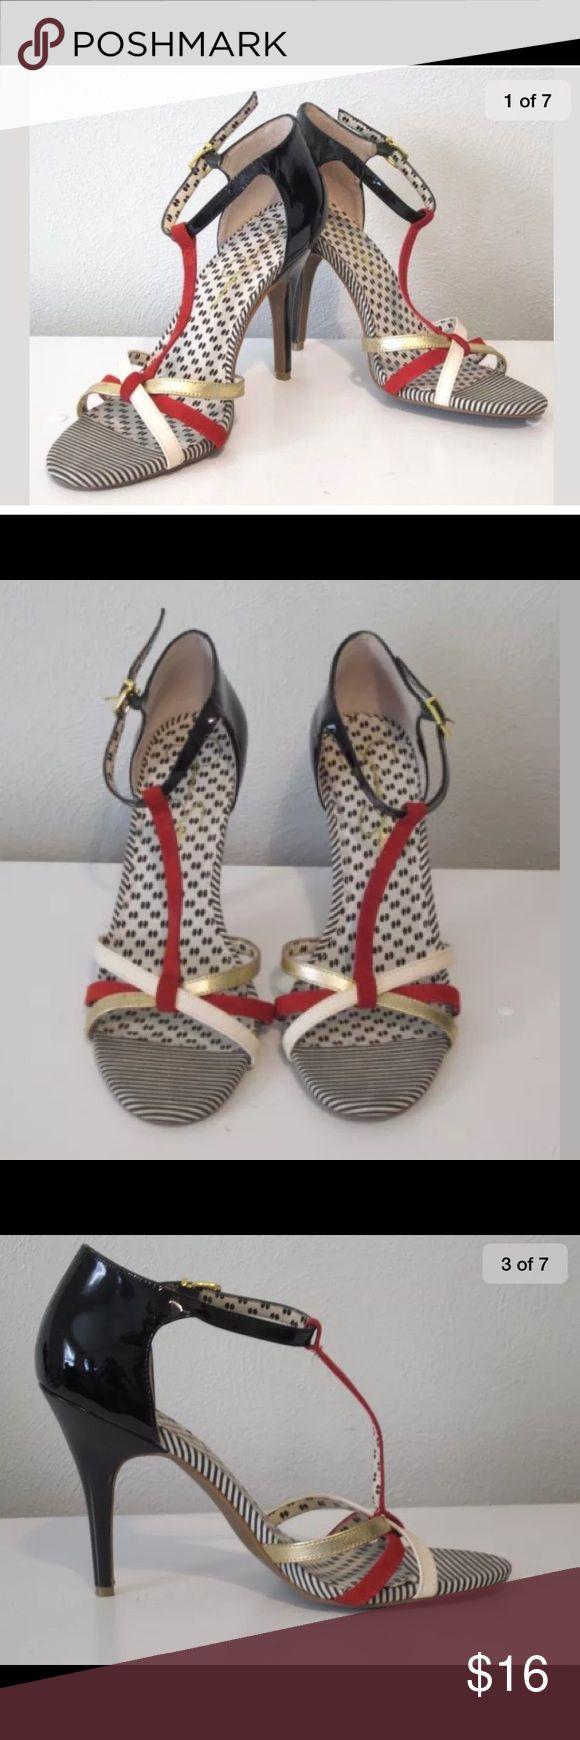 Jessica Simpson Red White Open Toe Heels 11B Jessica Simpson Red White Gold Black Strappy Open Toe Ankle Dancing Heels 11B Jessica Simpson Shoes Heels